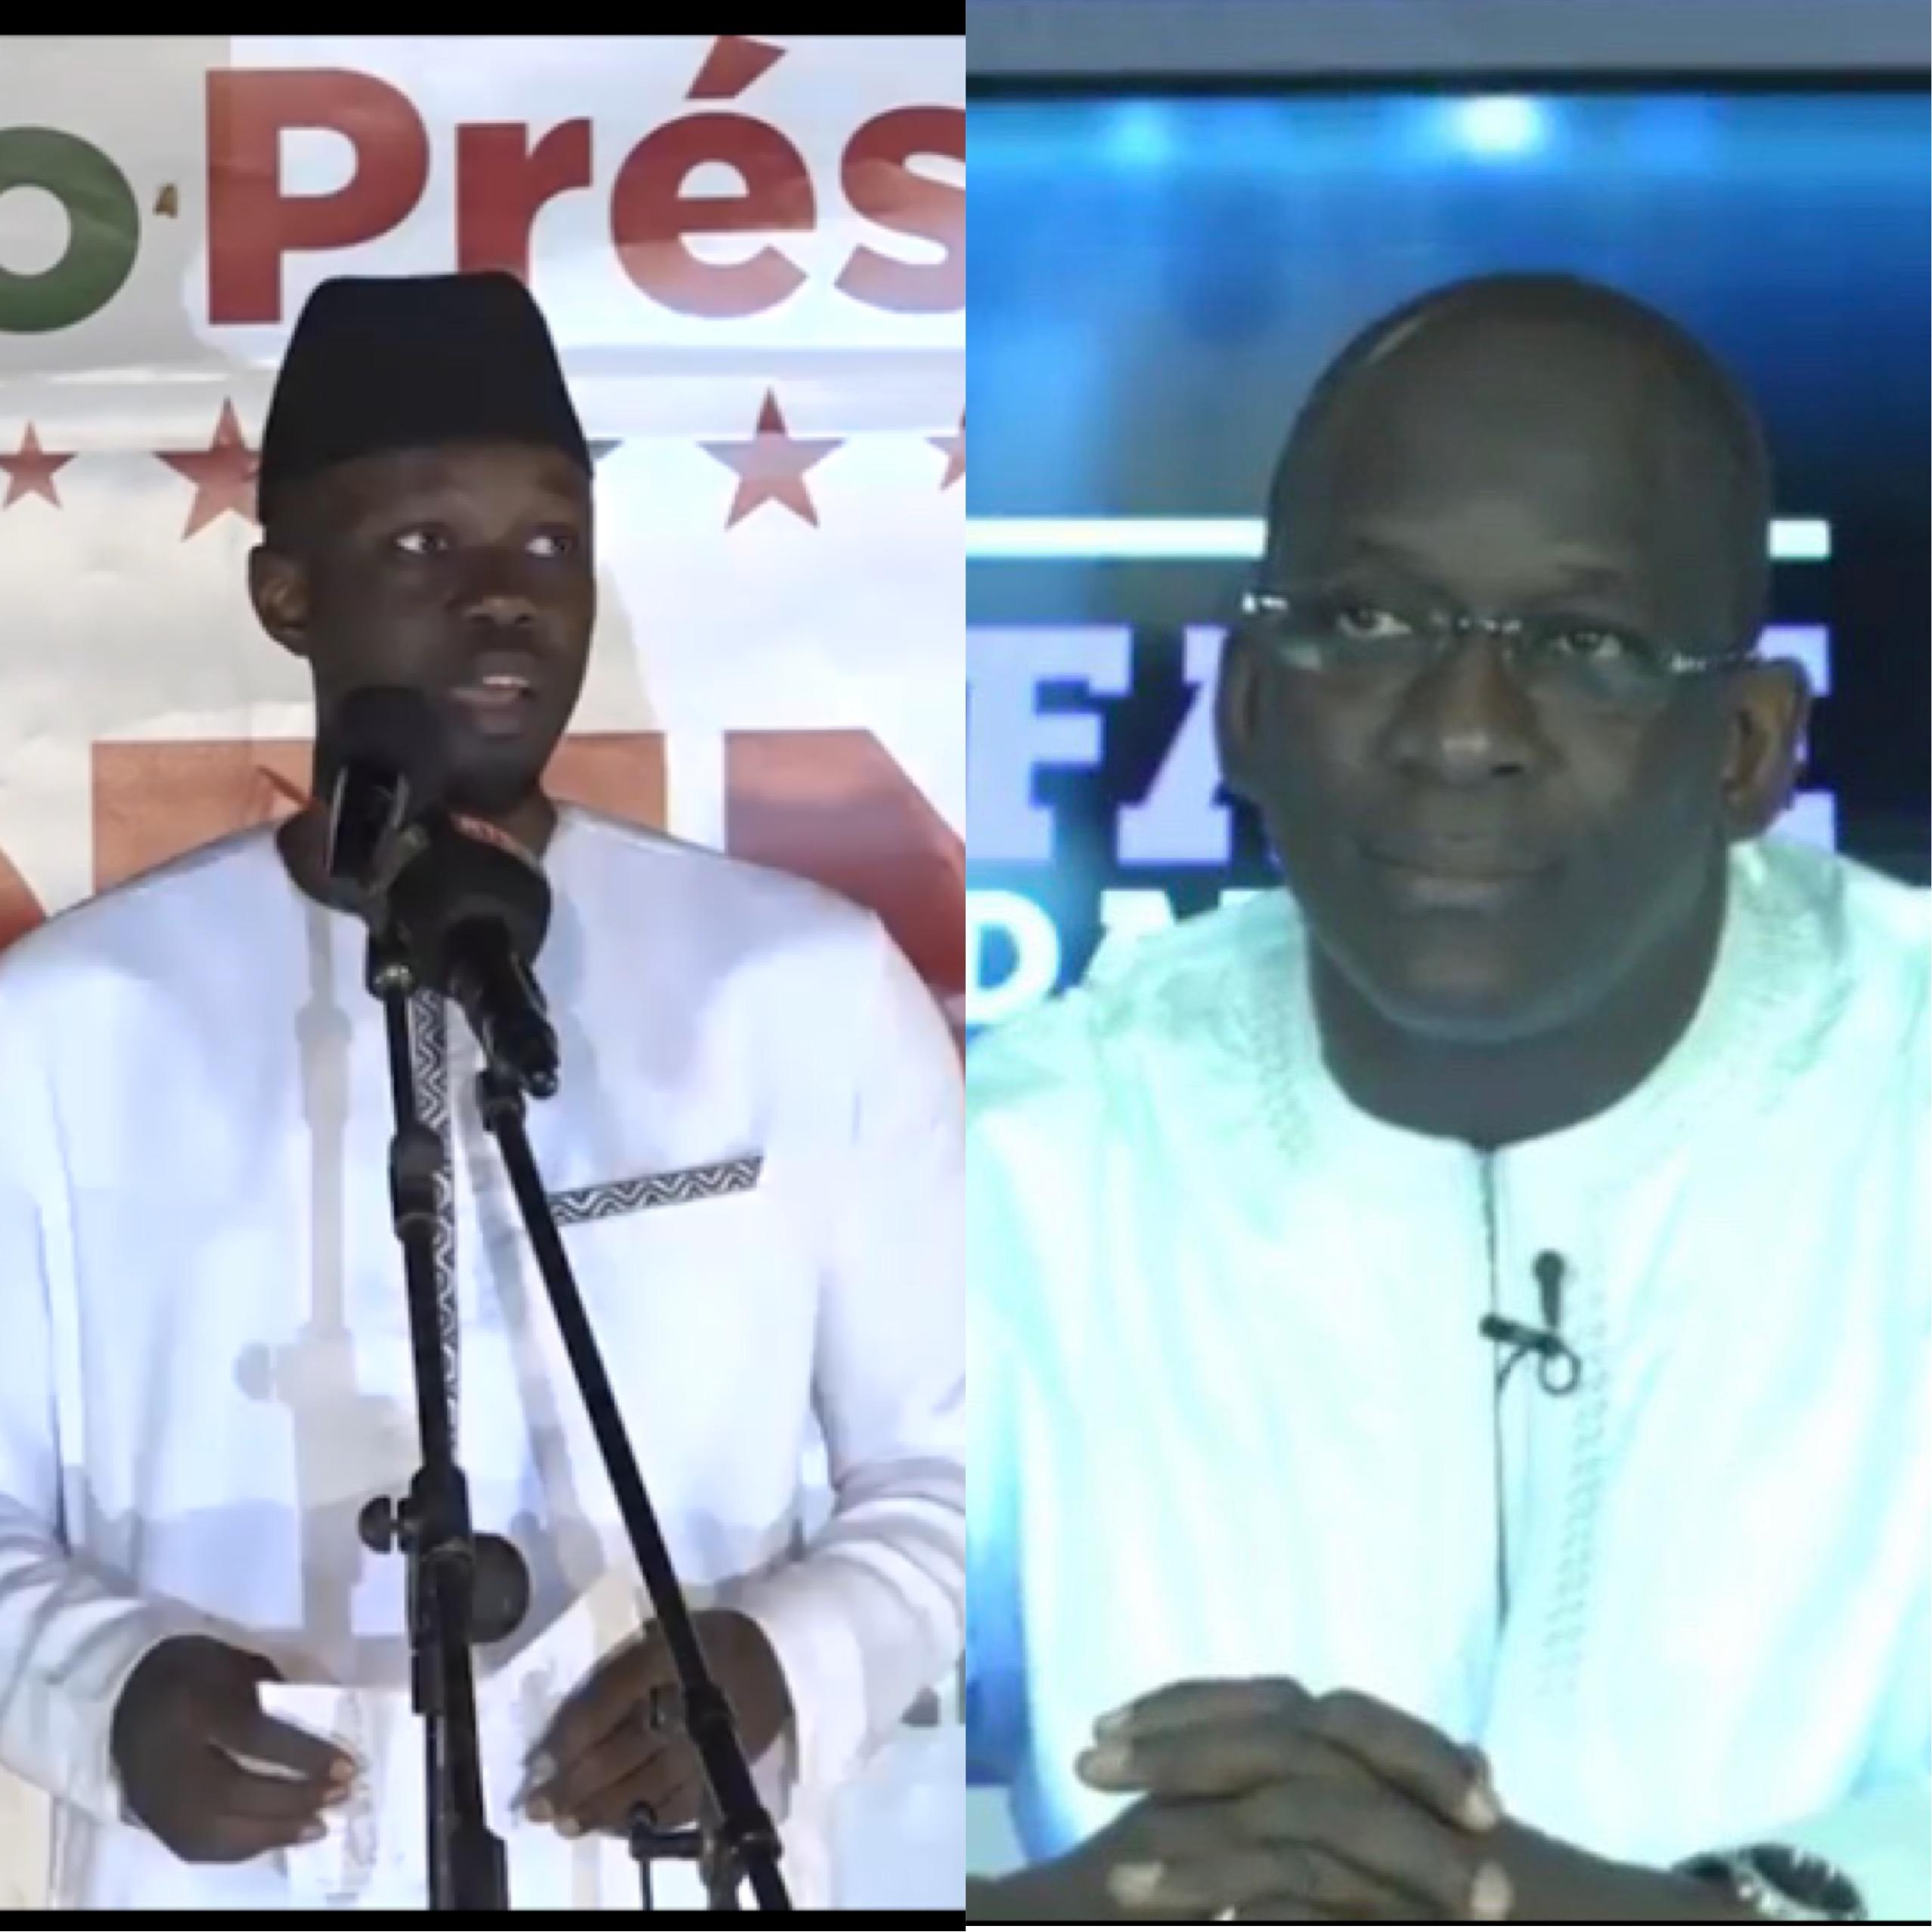 Abdoulaye Diouf Sarr et compagnie...tirent sur Ousmane Sonko